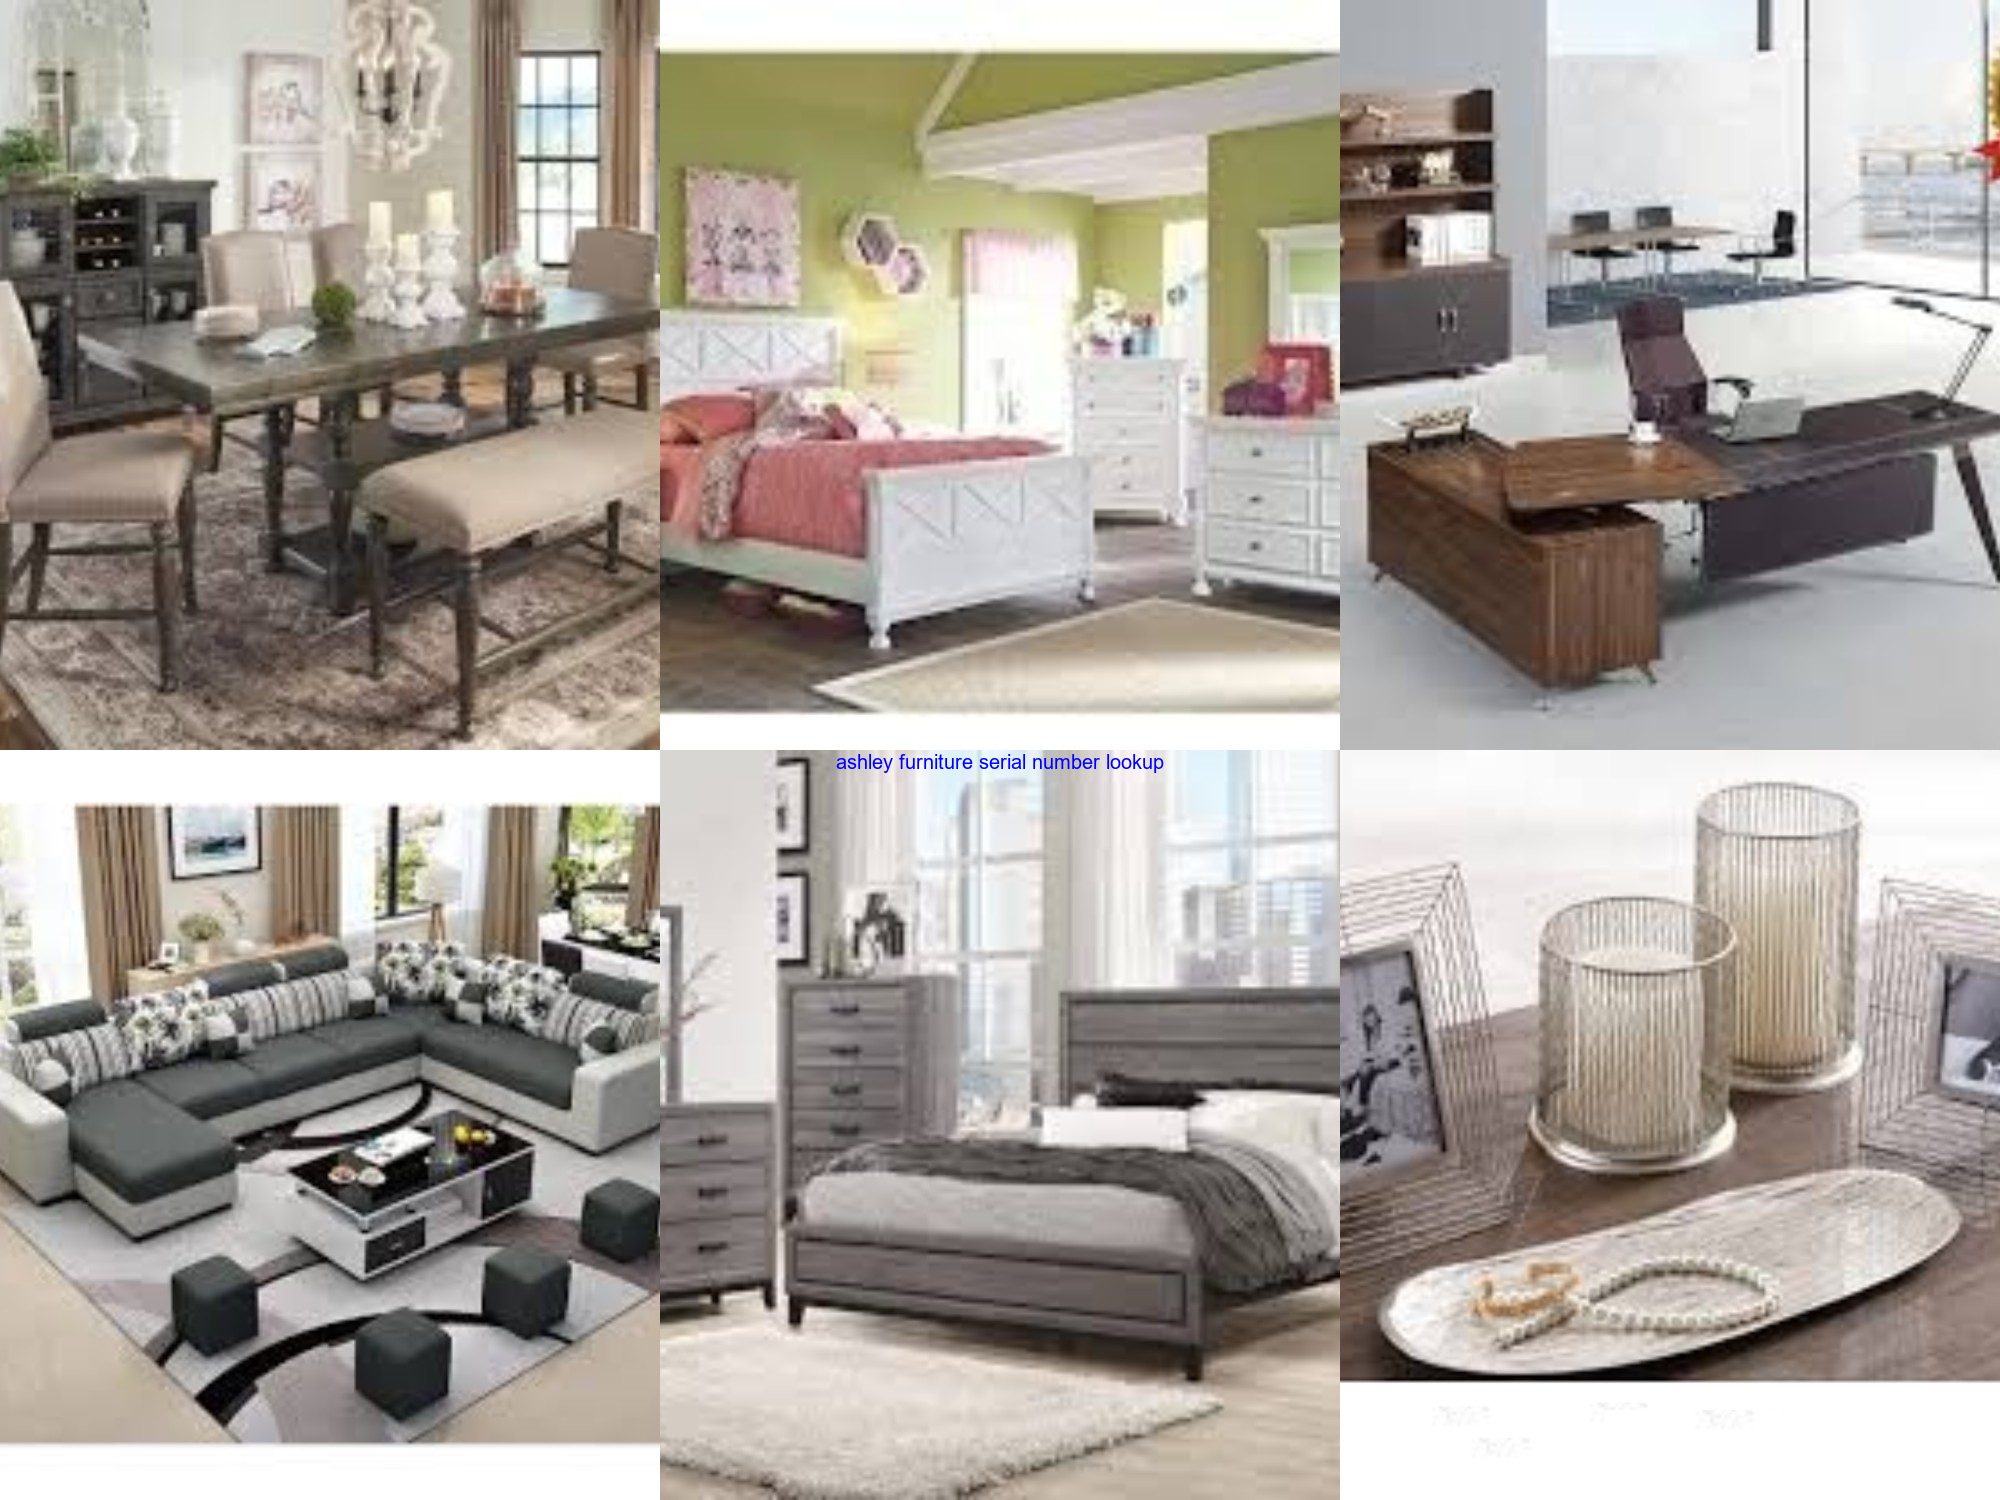 Ashley Furniture Serial Number Lookup In 2020 Furniture Prices Ashley Furniture Furniture Reviews